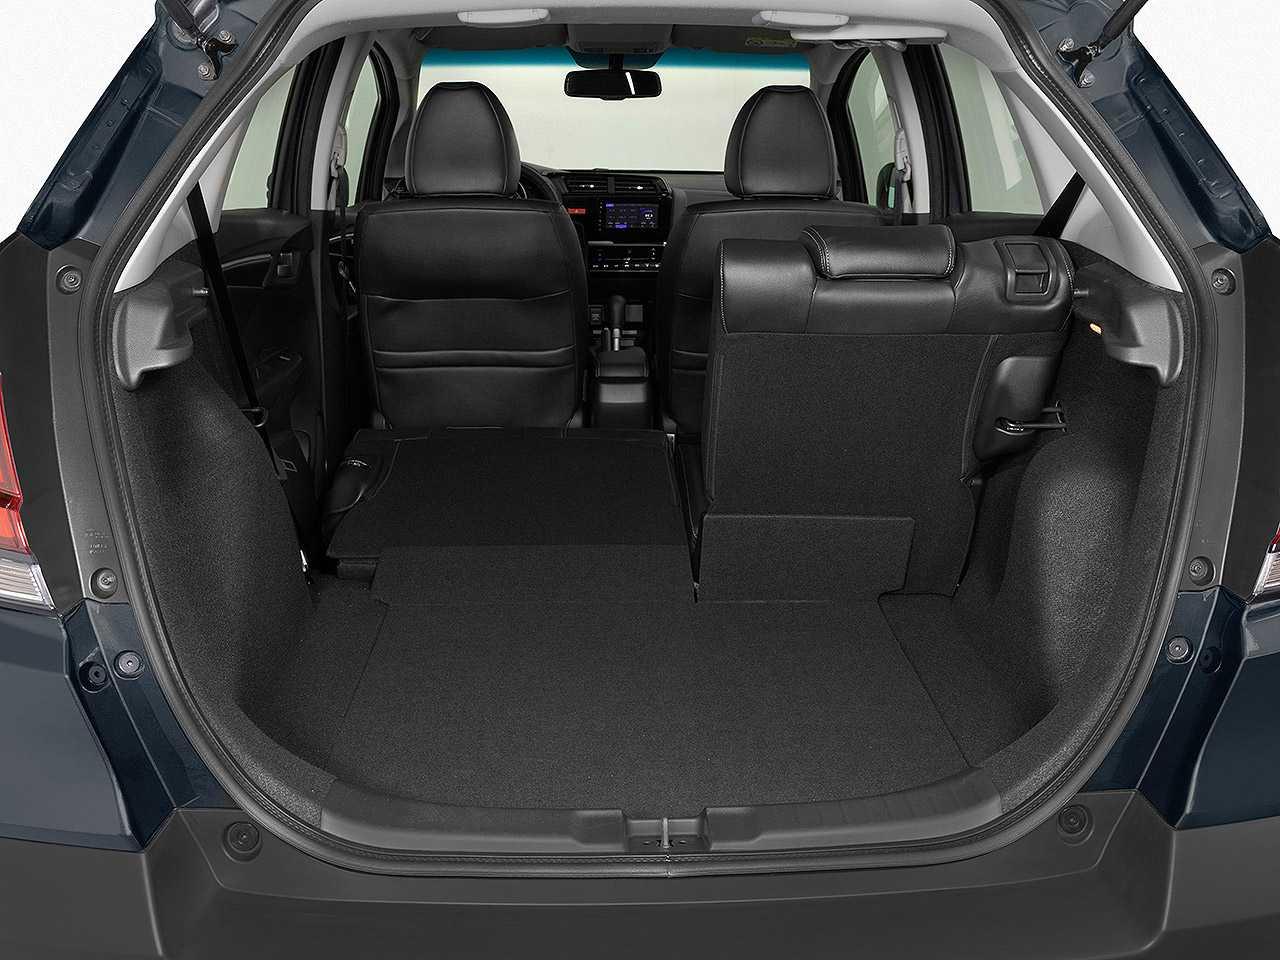 HondaWR-V 2021 - porta-malas